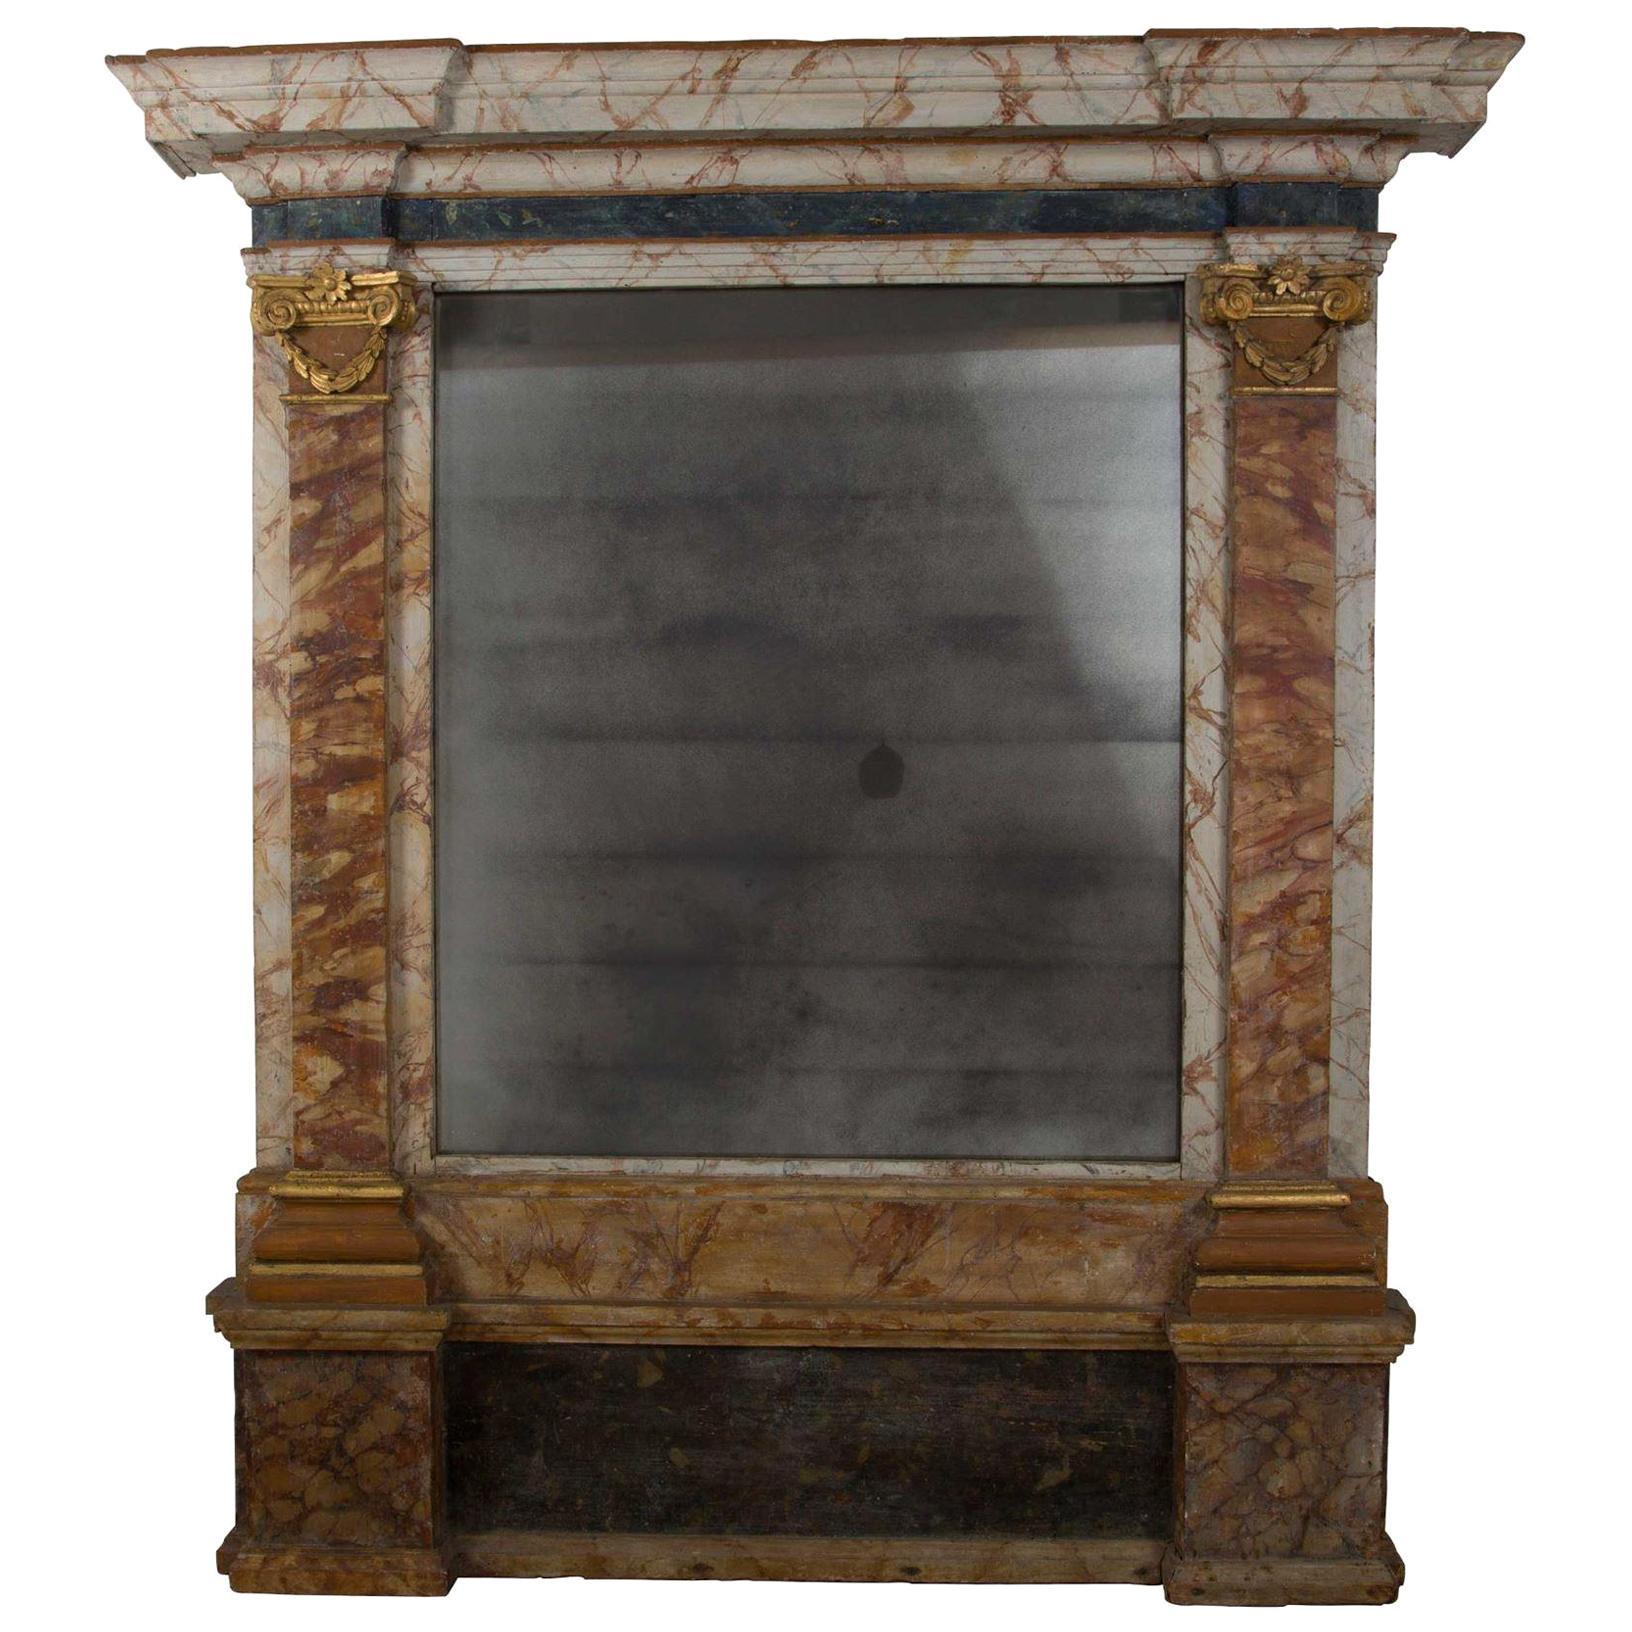 Large Italian Simulated Marble Mirror